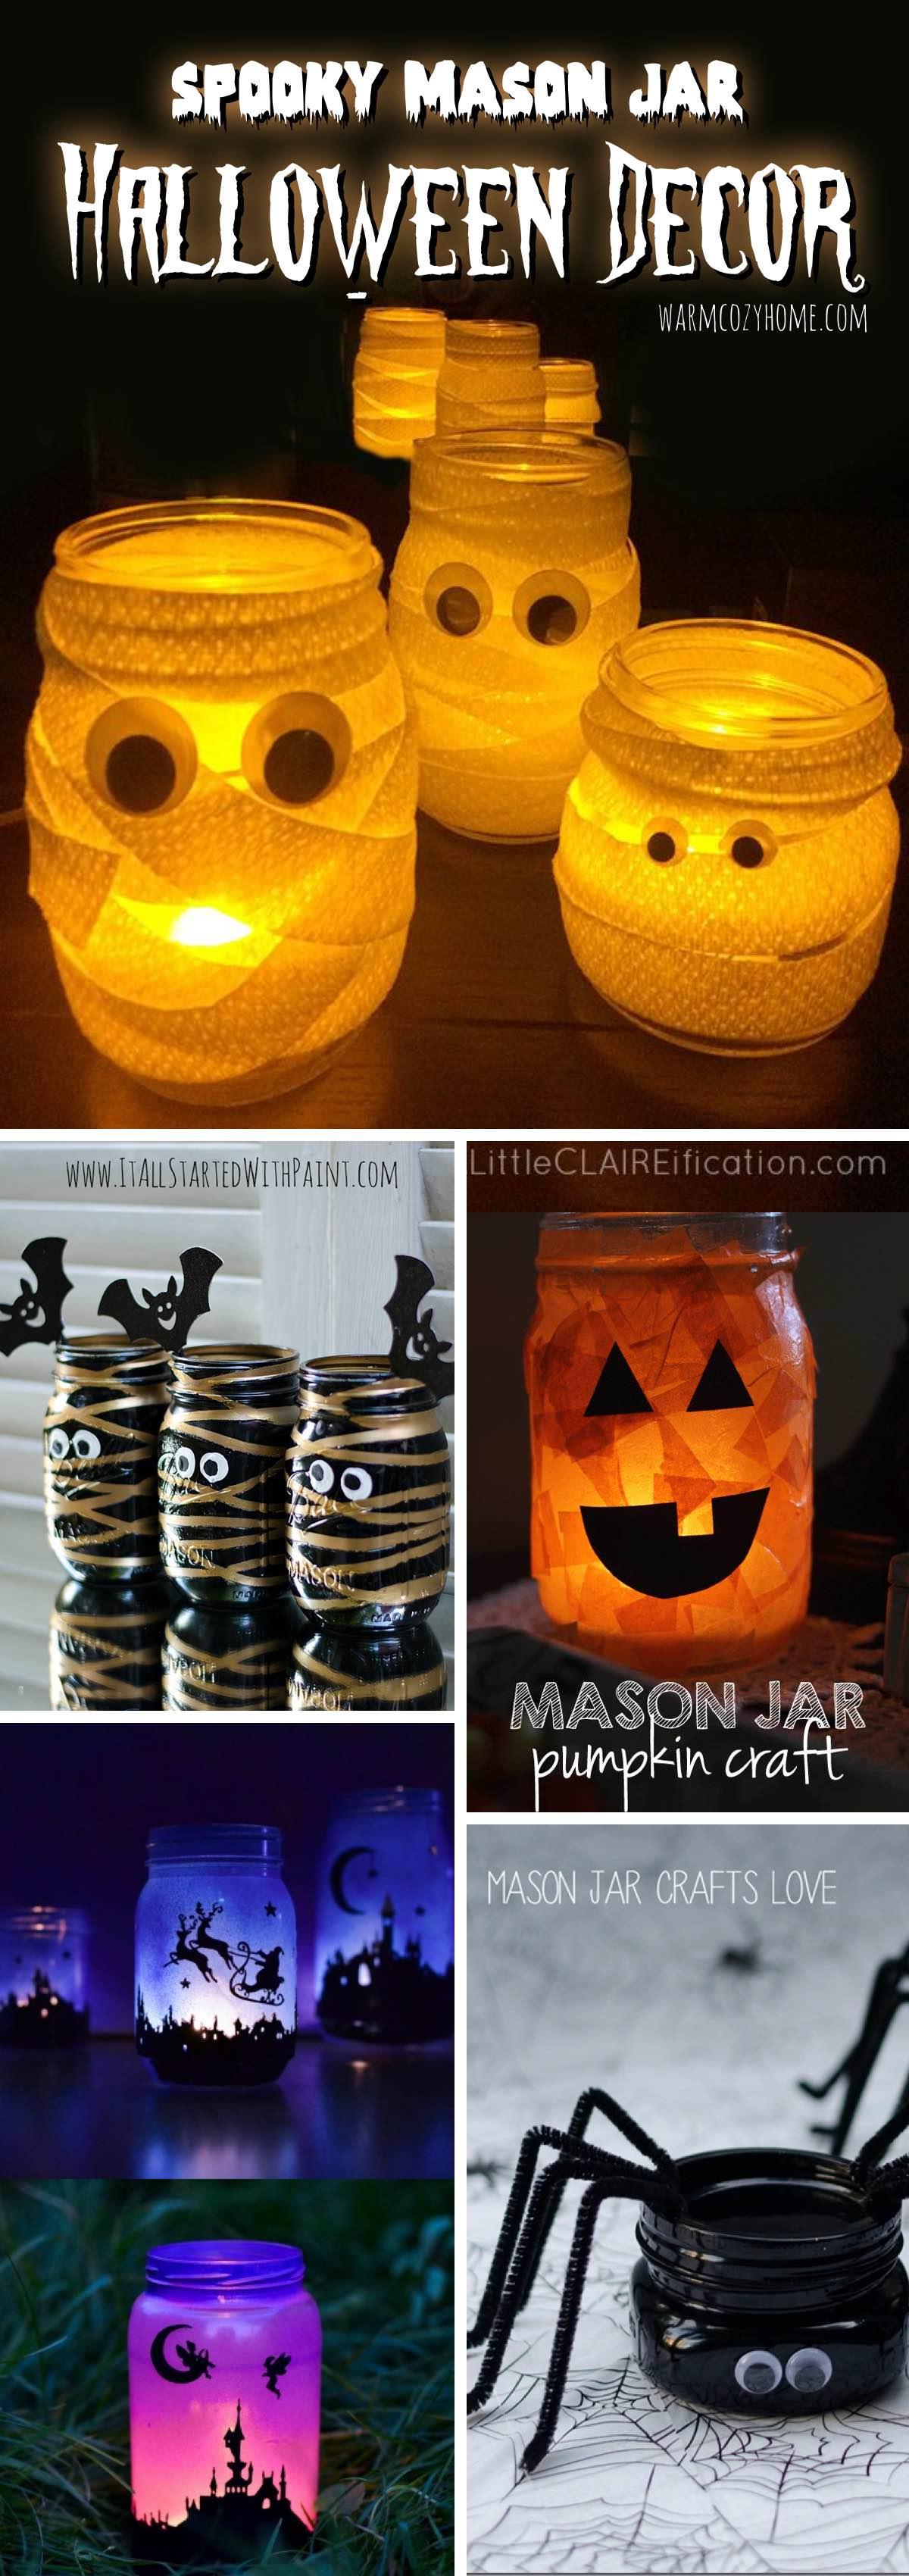 Spooky Mason Jar Halloween Decor Ideas